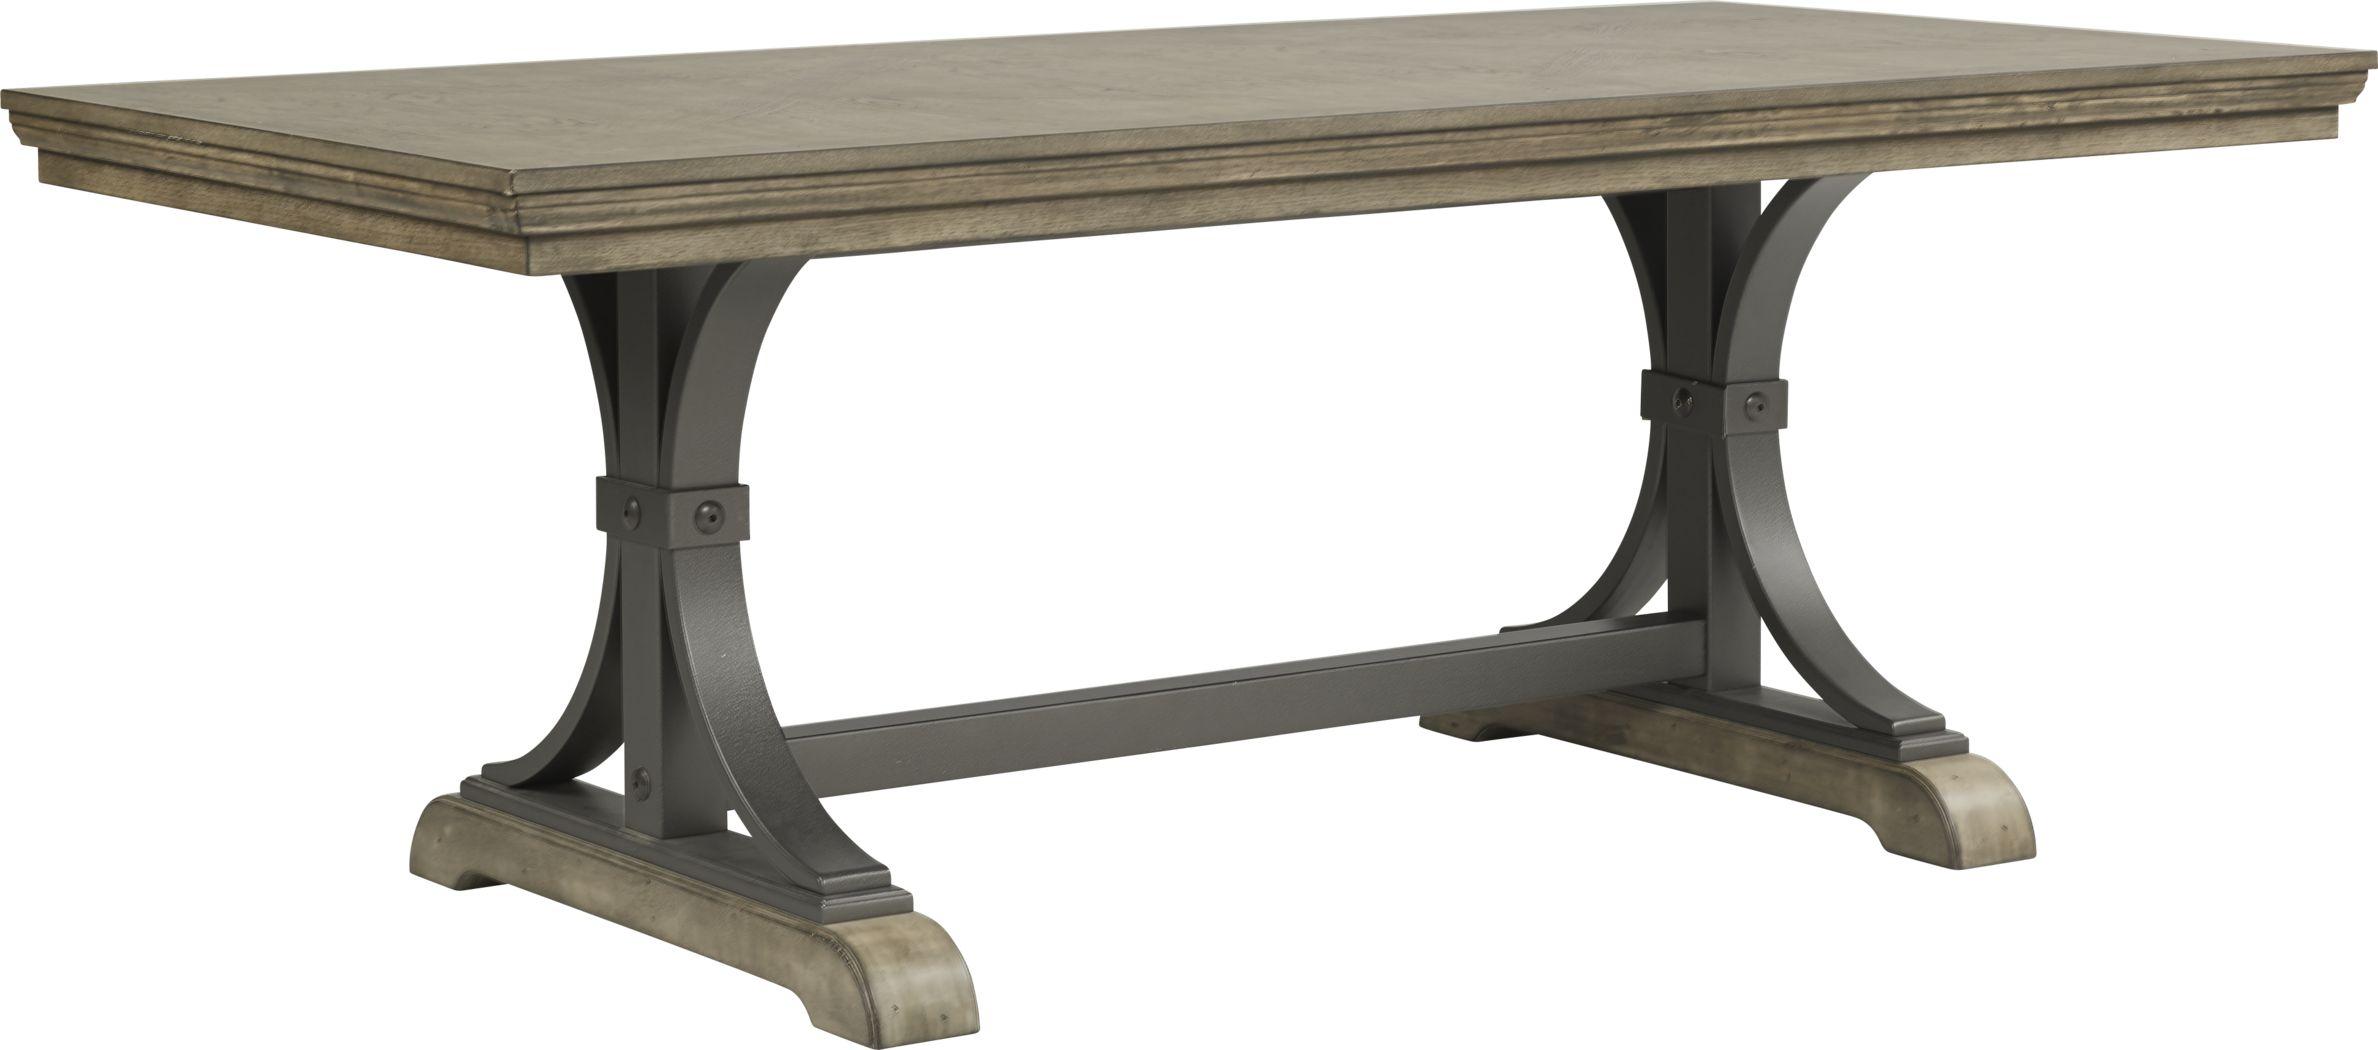 Sierra Vista Driftwood Rectangle Dining Table